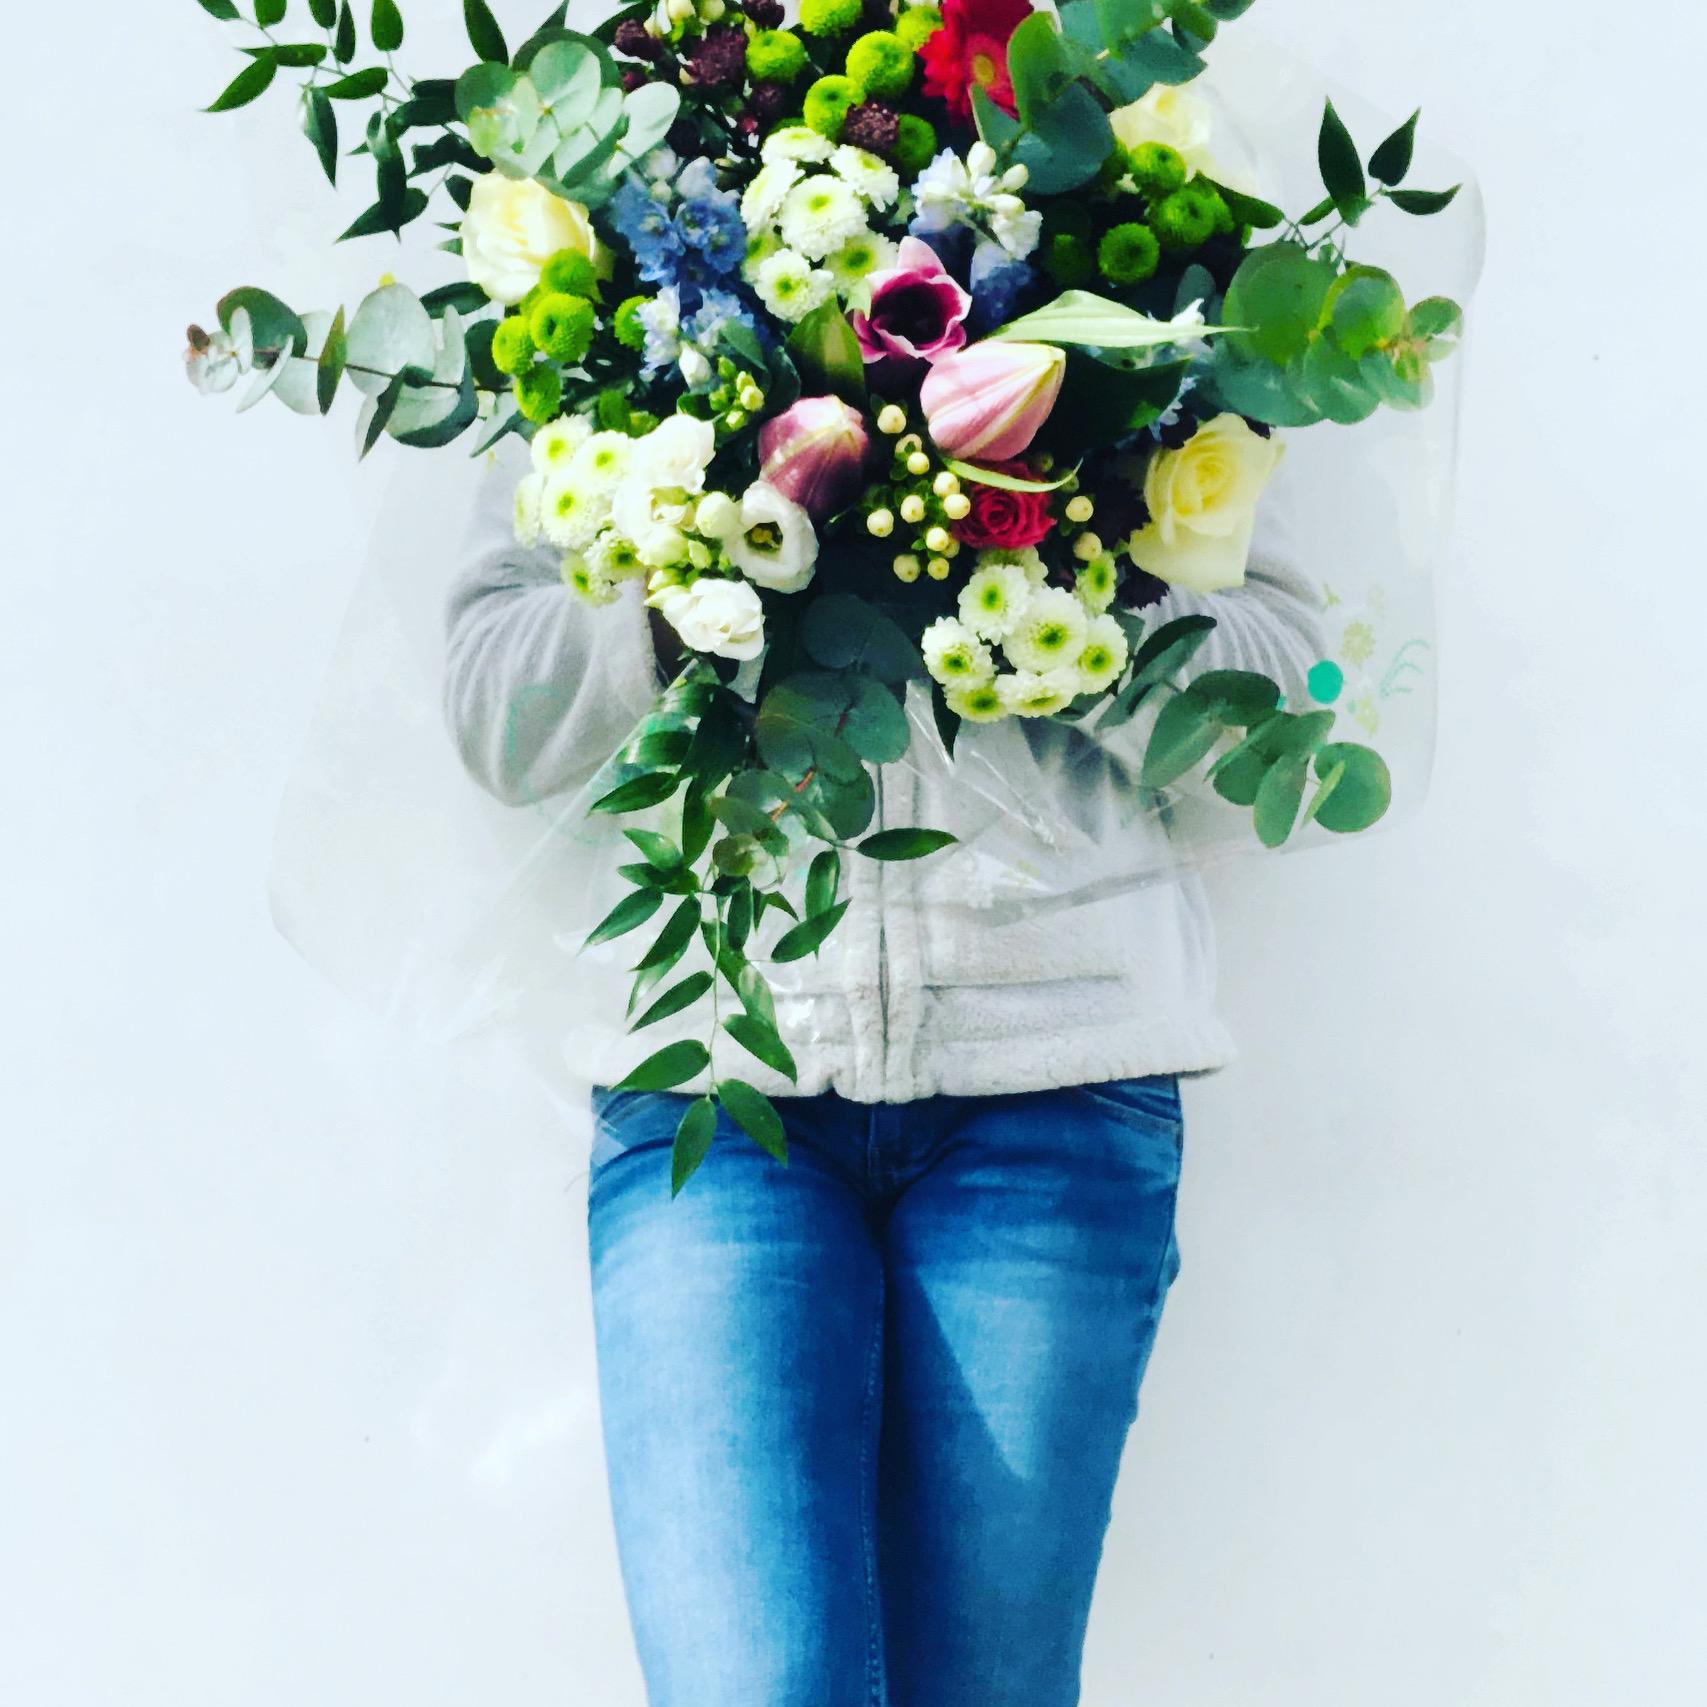 Atelier floral 64,Virginie Sartis,Ateliers créatifs,Zôdio Bayonne